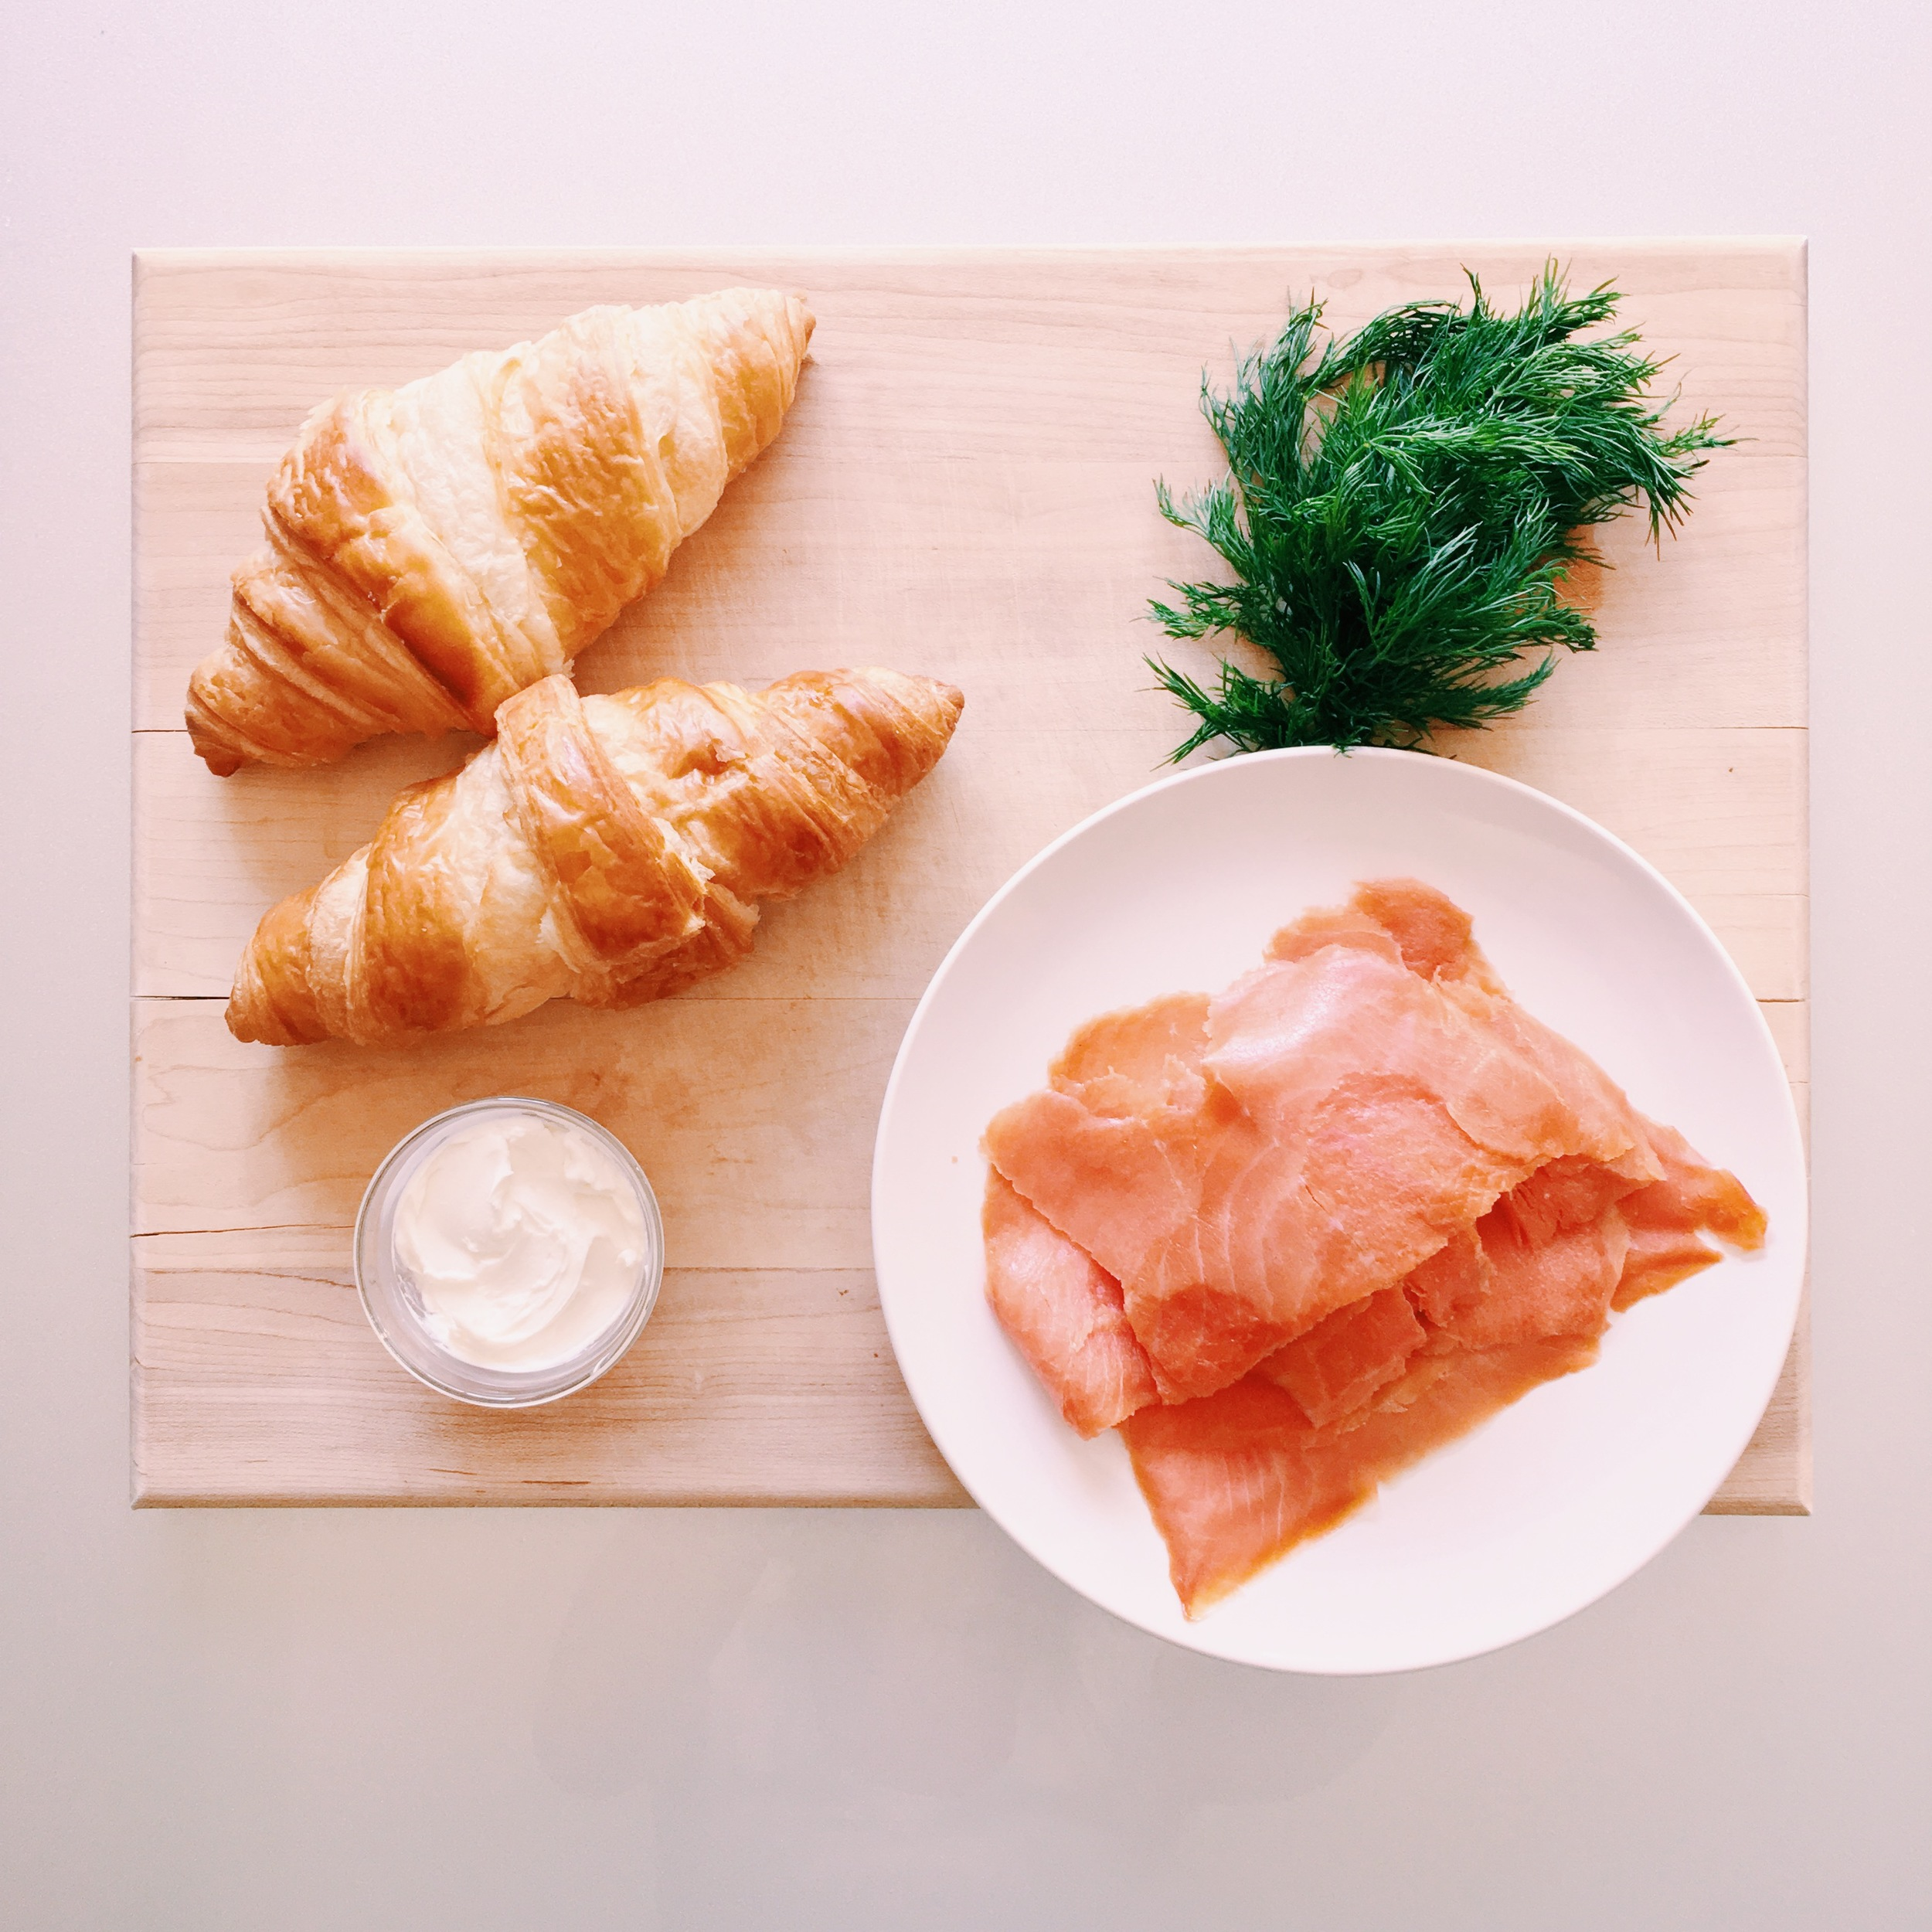 Smoked Salmon Cream Cheese Croissant